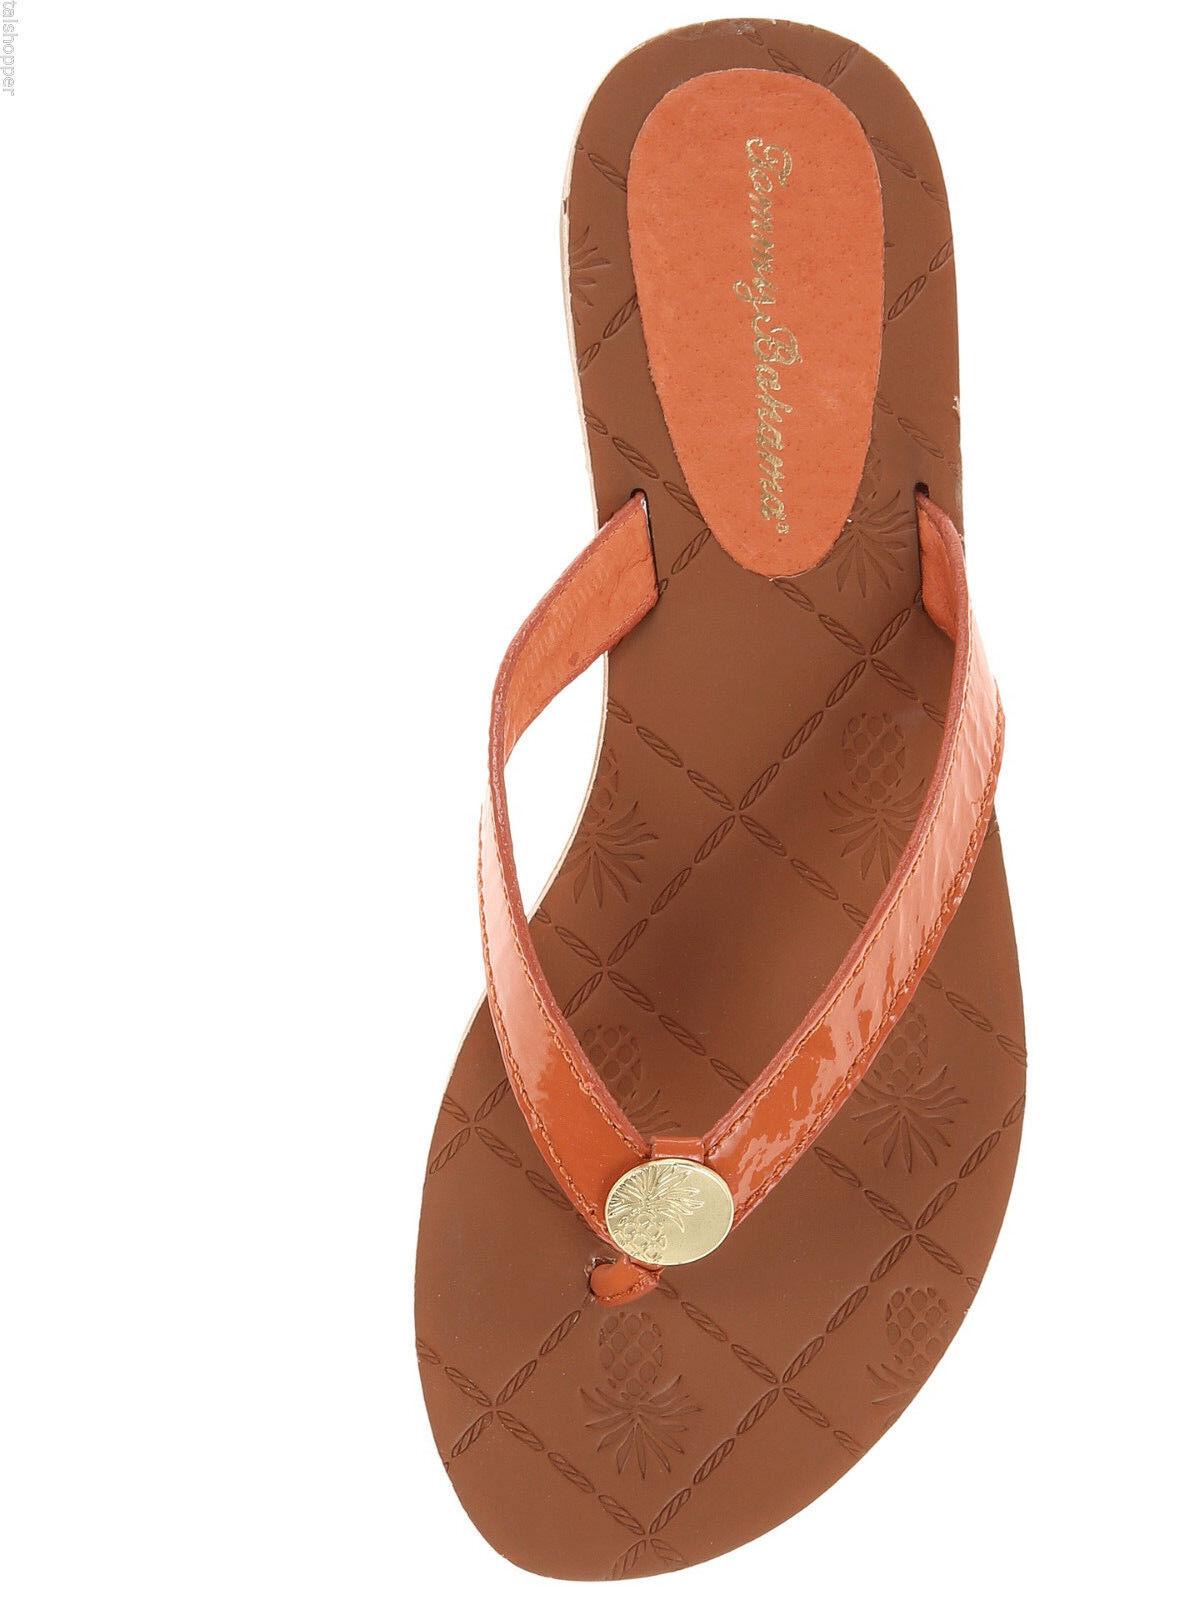 Tommy Bahama Havana Patent Leder Beach Thong Flip Flops NEW Sandales Poppy 7 M NEW Flops 0bbeac